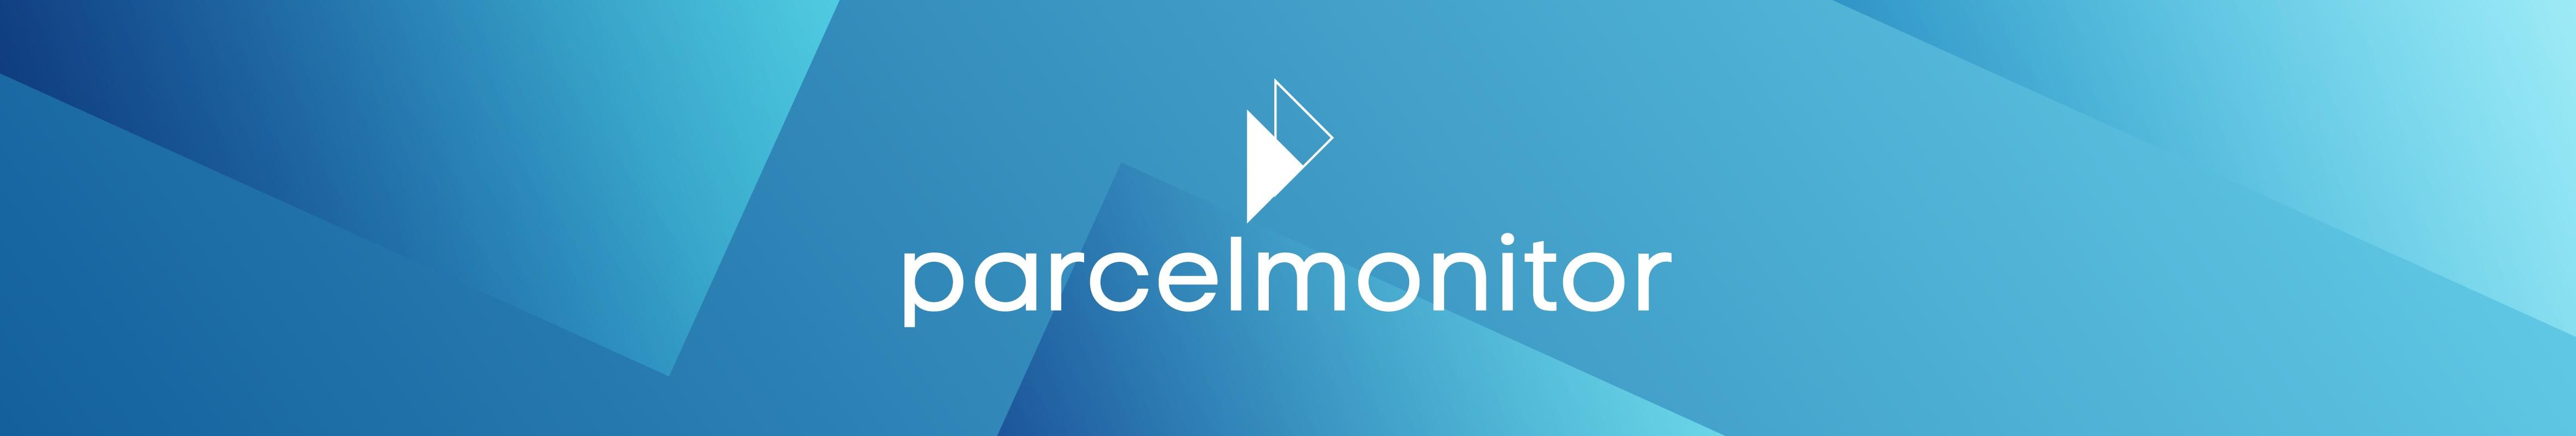 Parcel Monitor  E-Commerce Logistics Community  LinkedIn